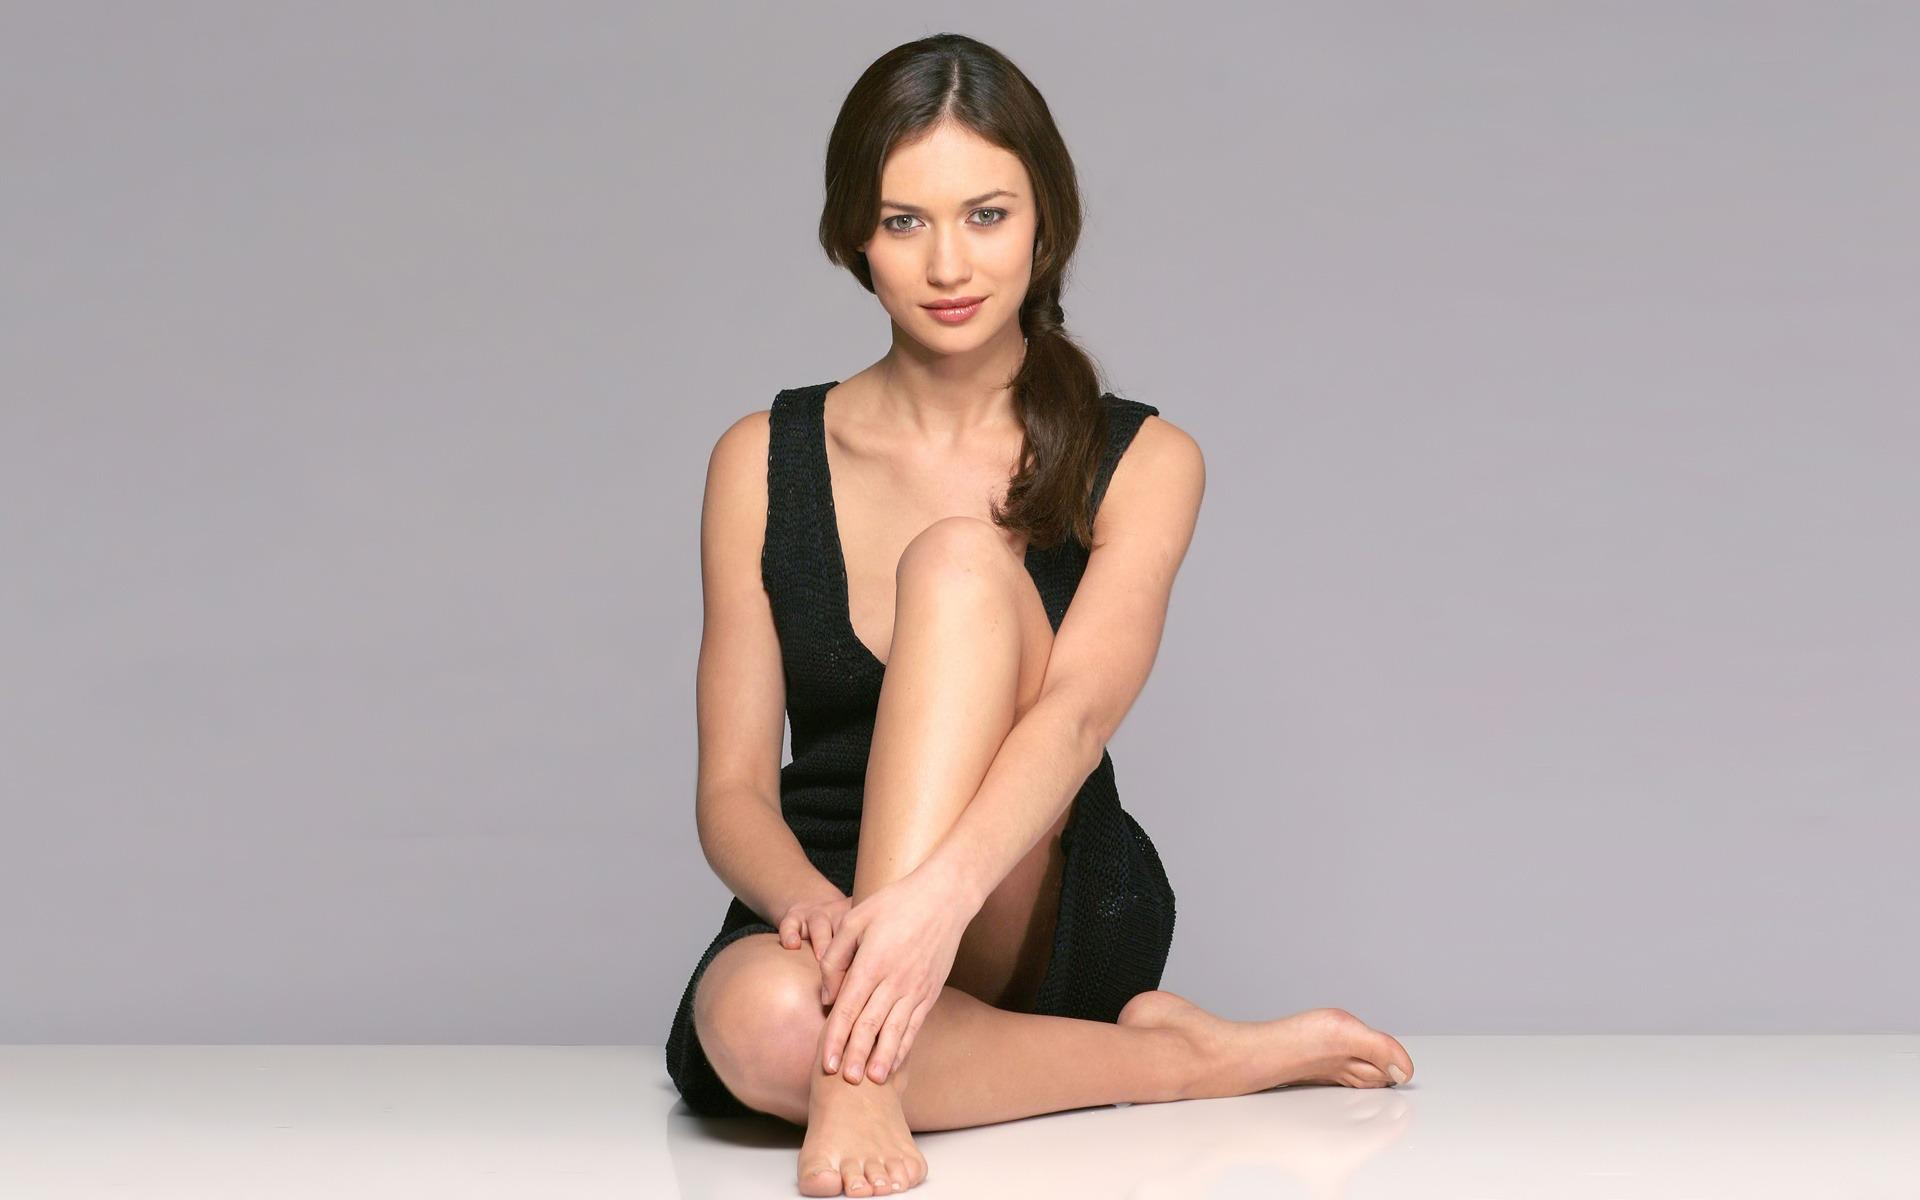 Olga Kurylenko as a Model